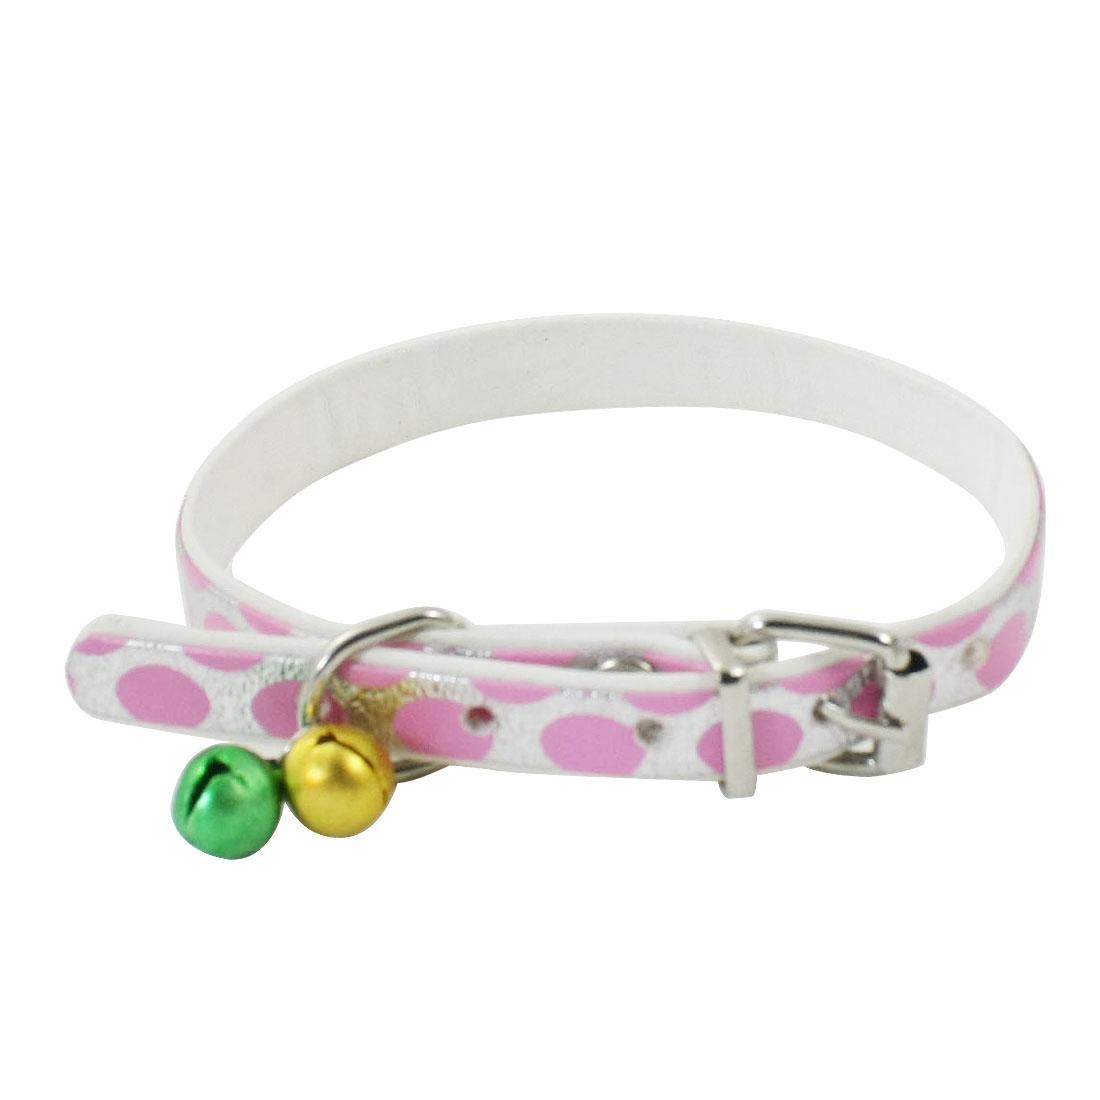 Single Pin Buckle Belt Jingle Bell Cat Dog Pets Neck Collar Pink Silver Tone